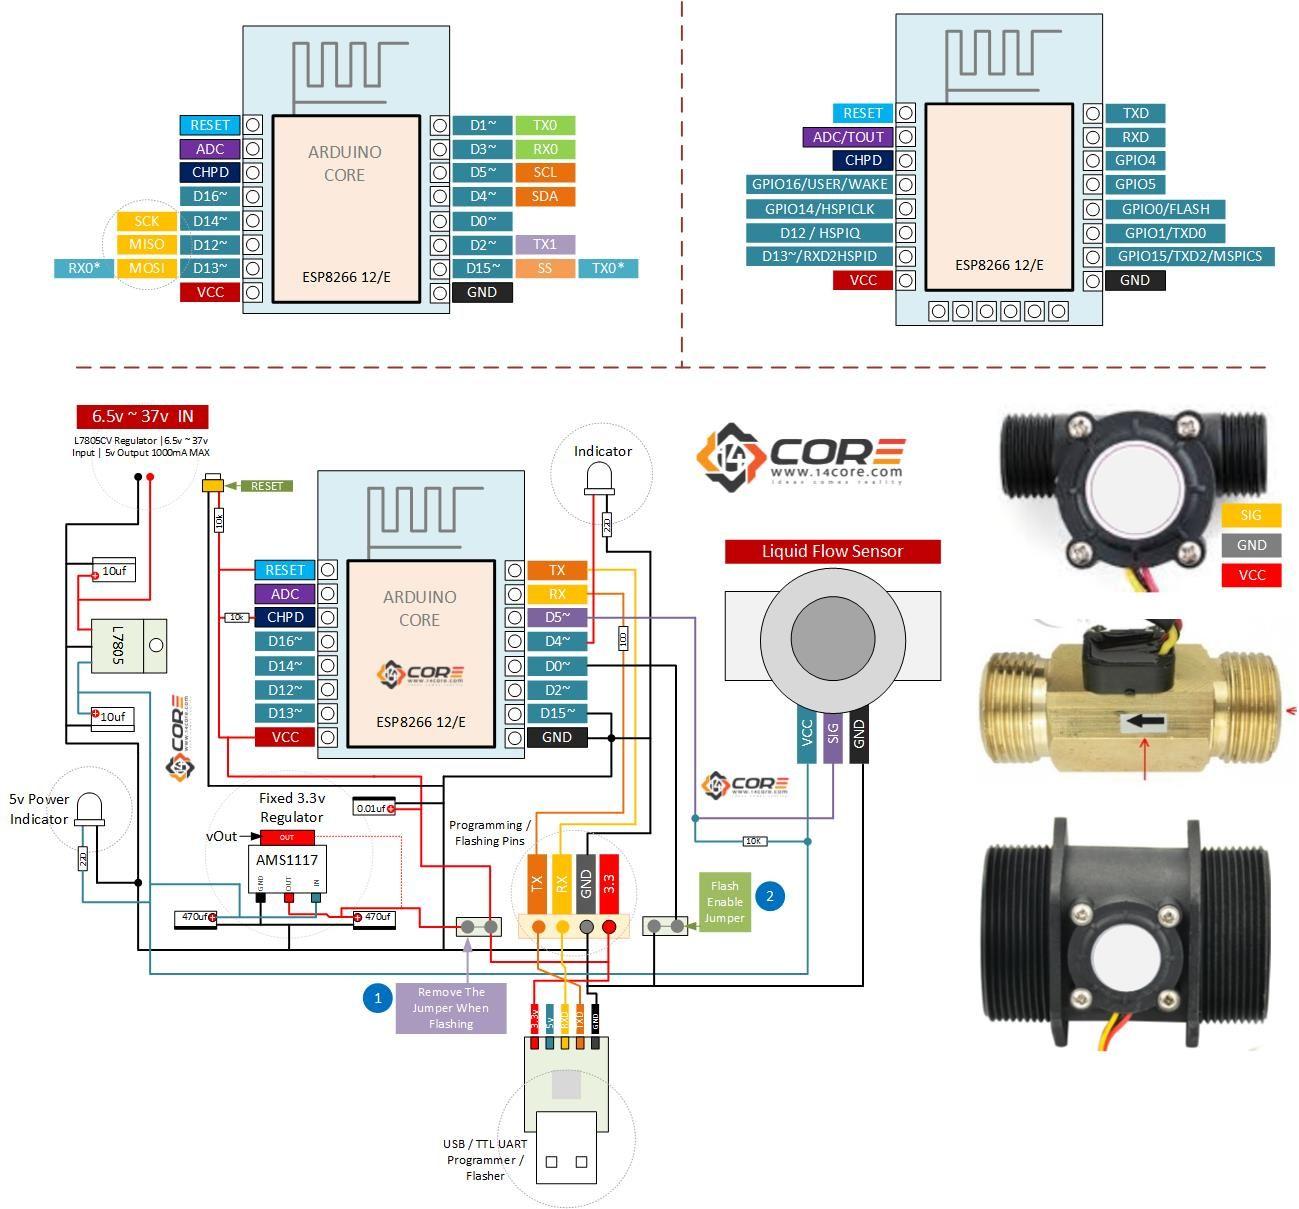 Wiring Esp8266 12 12e With G1 2 Liquid Water Flow Sensor On Wireless Monitoring 14core Com Sensor Water Flow Wireless